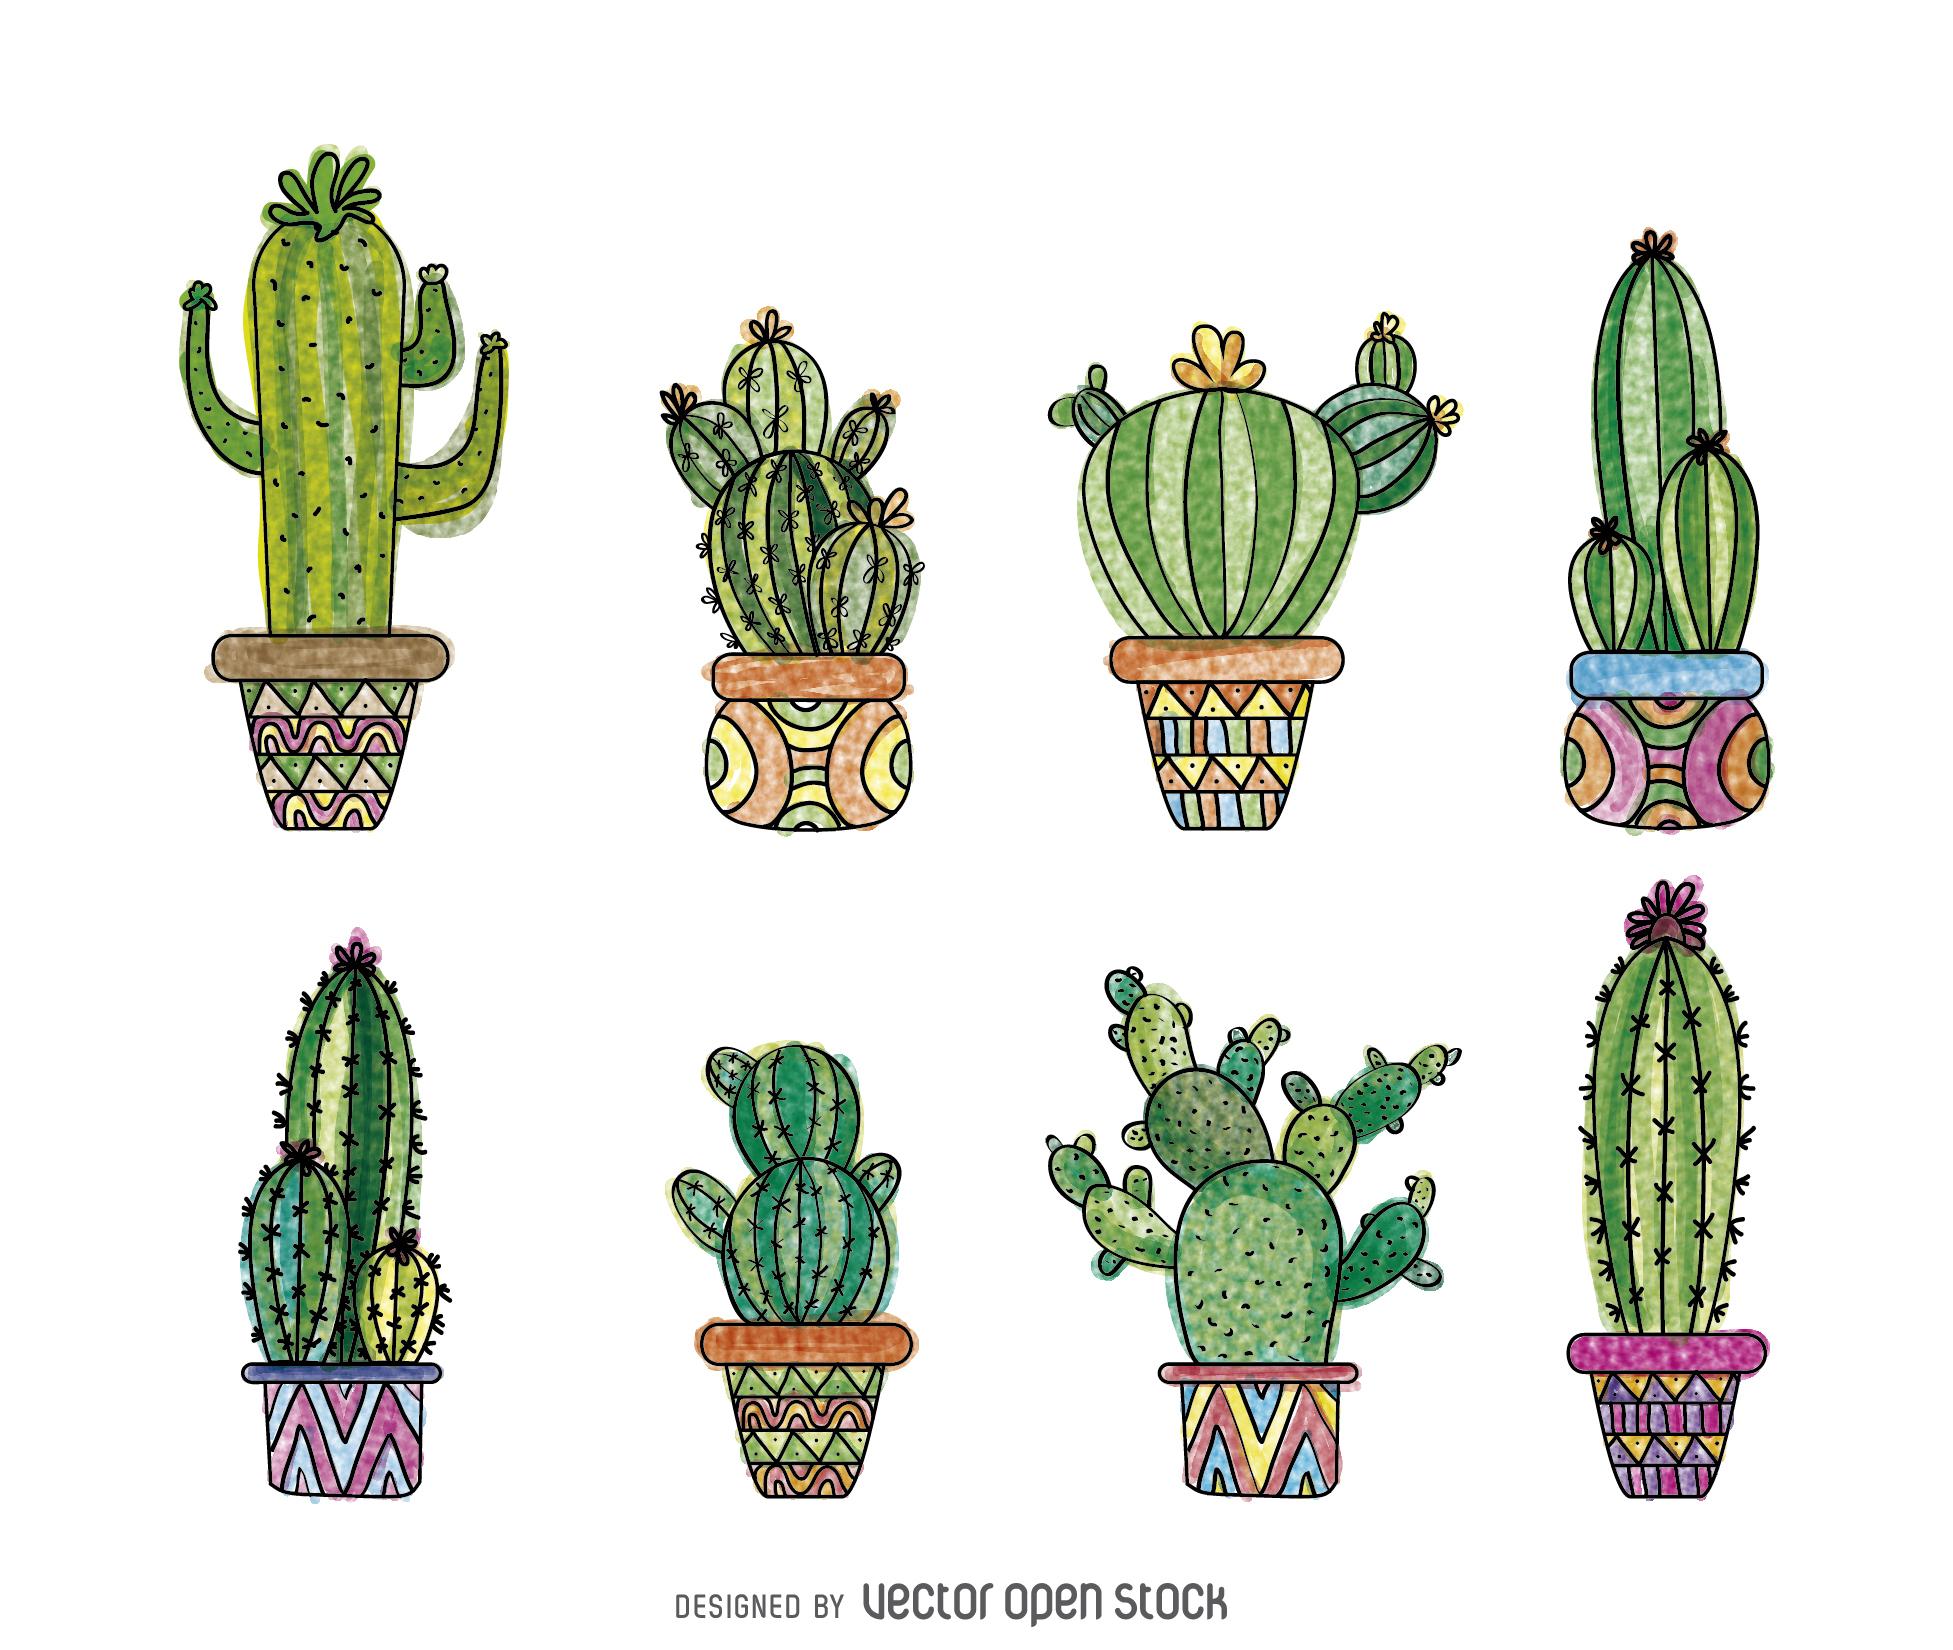 Drawn cactus Cactus Hand drawn Hand download